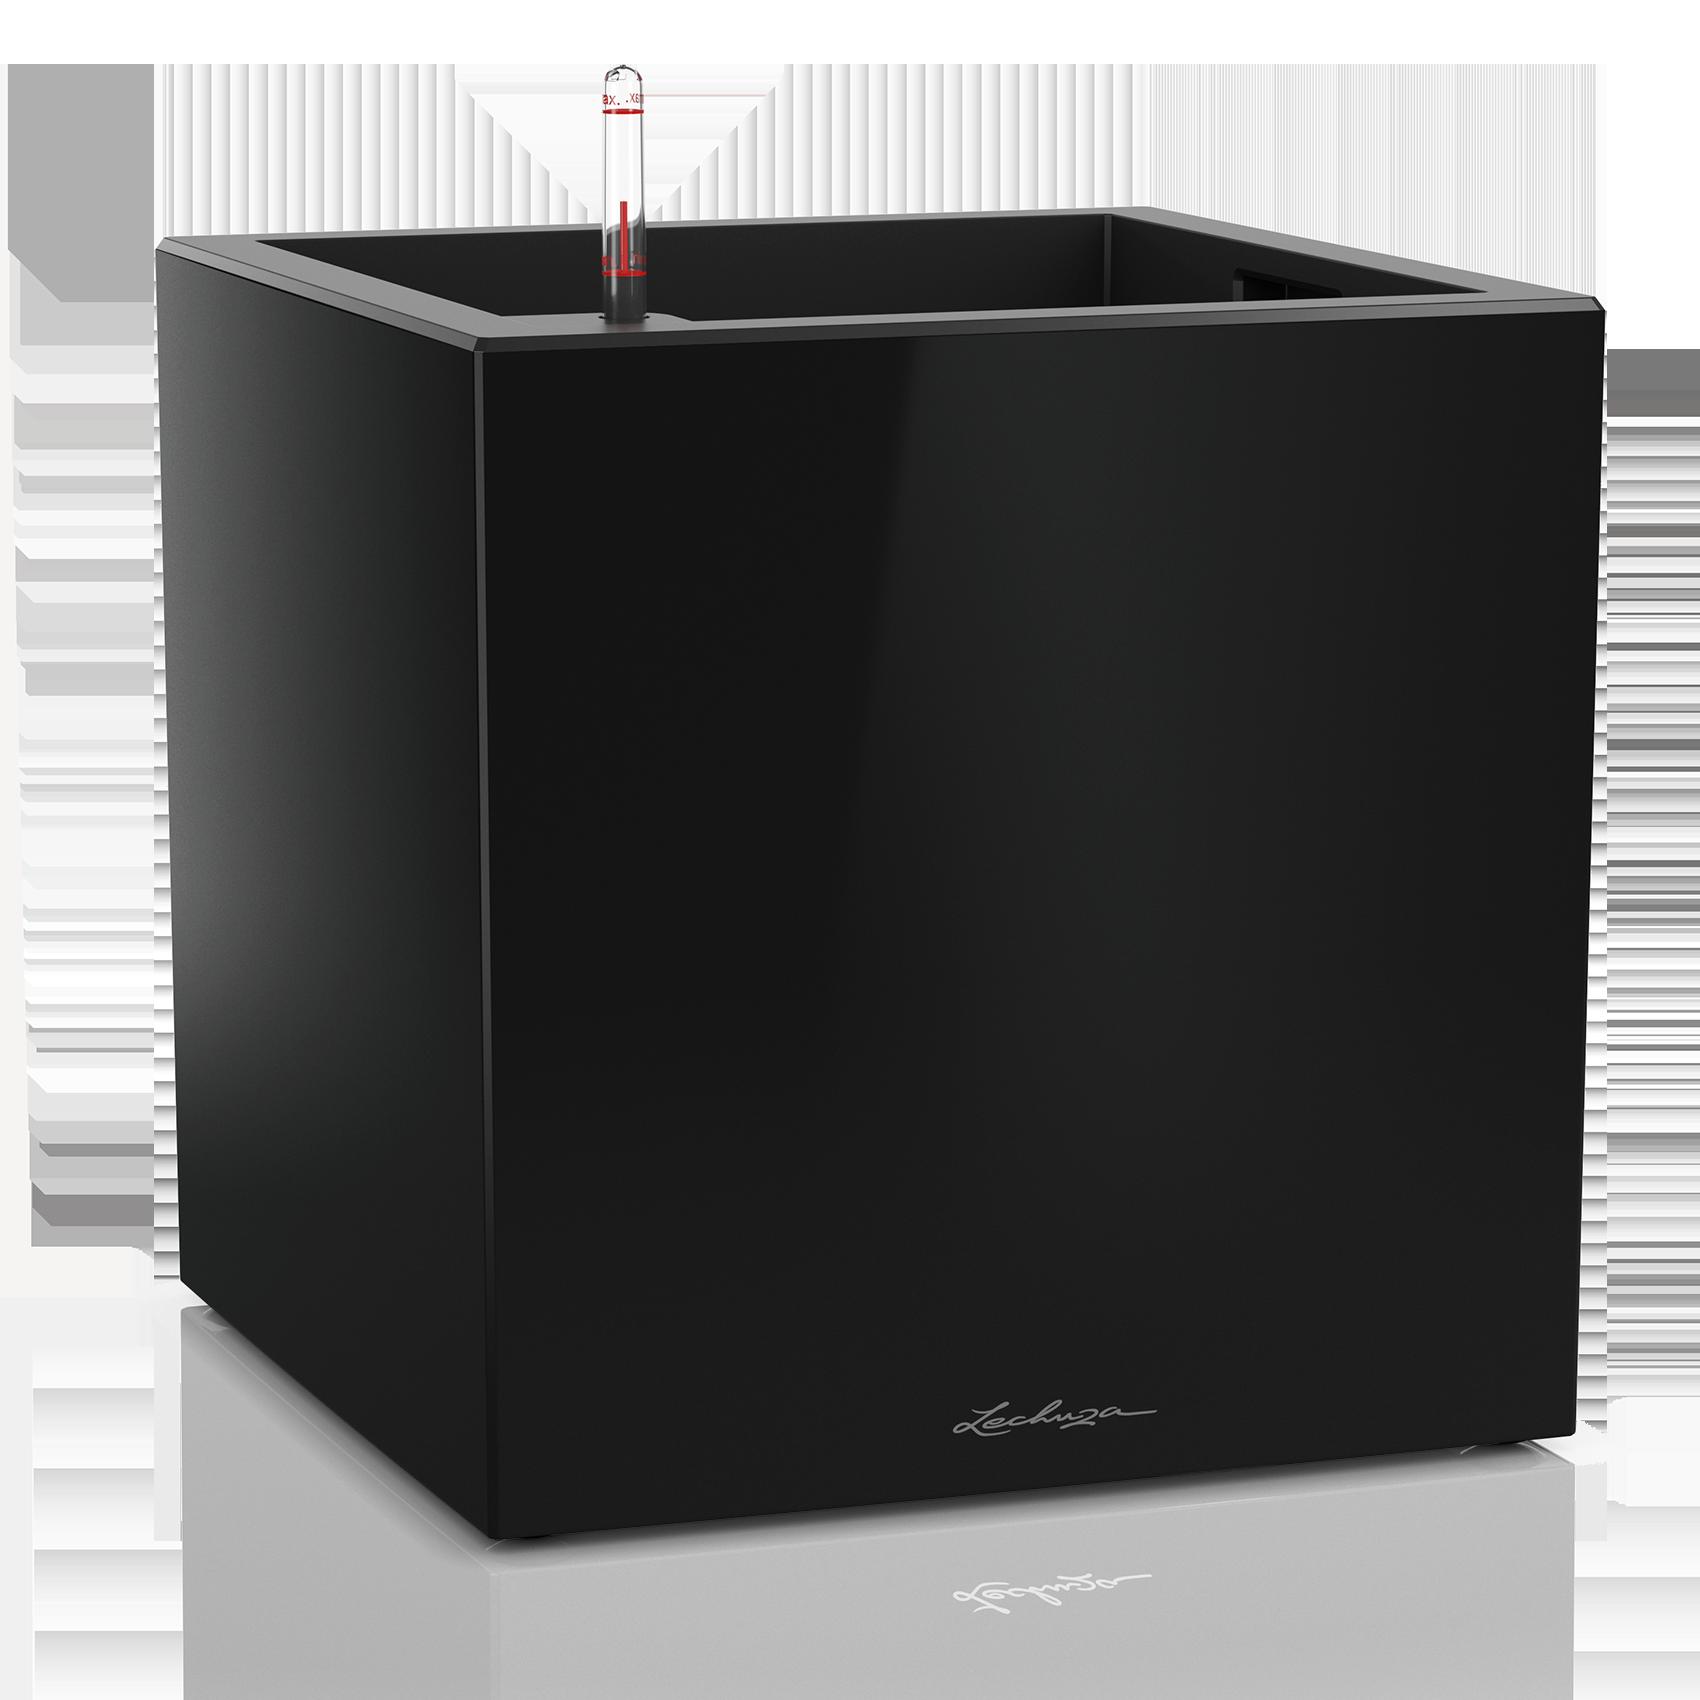 CANTO Cube 40 black high-gloss